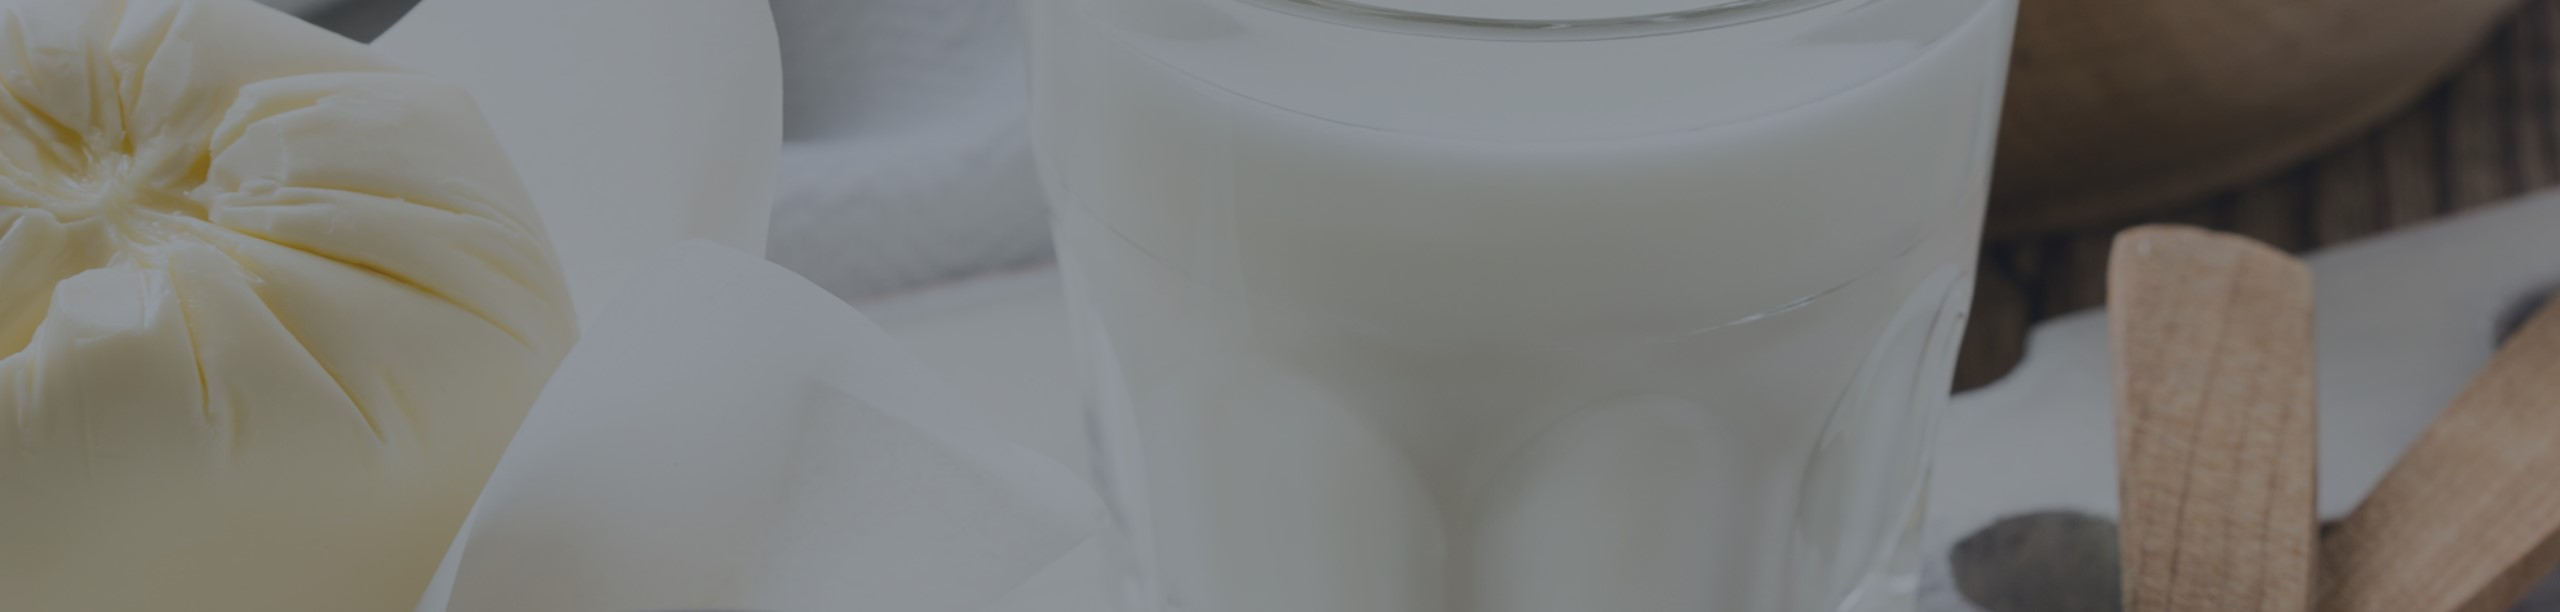 Dairy3-2